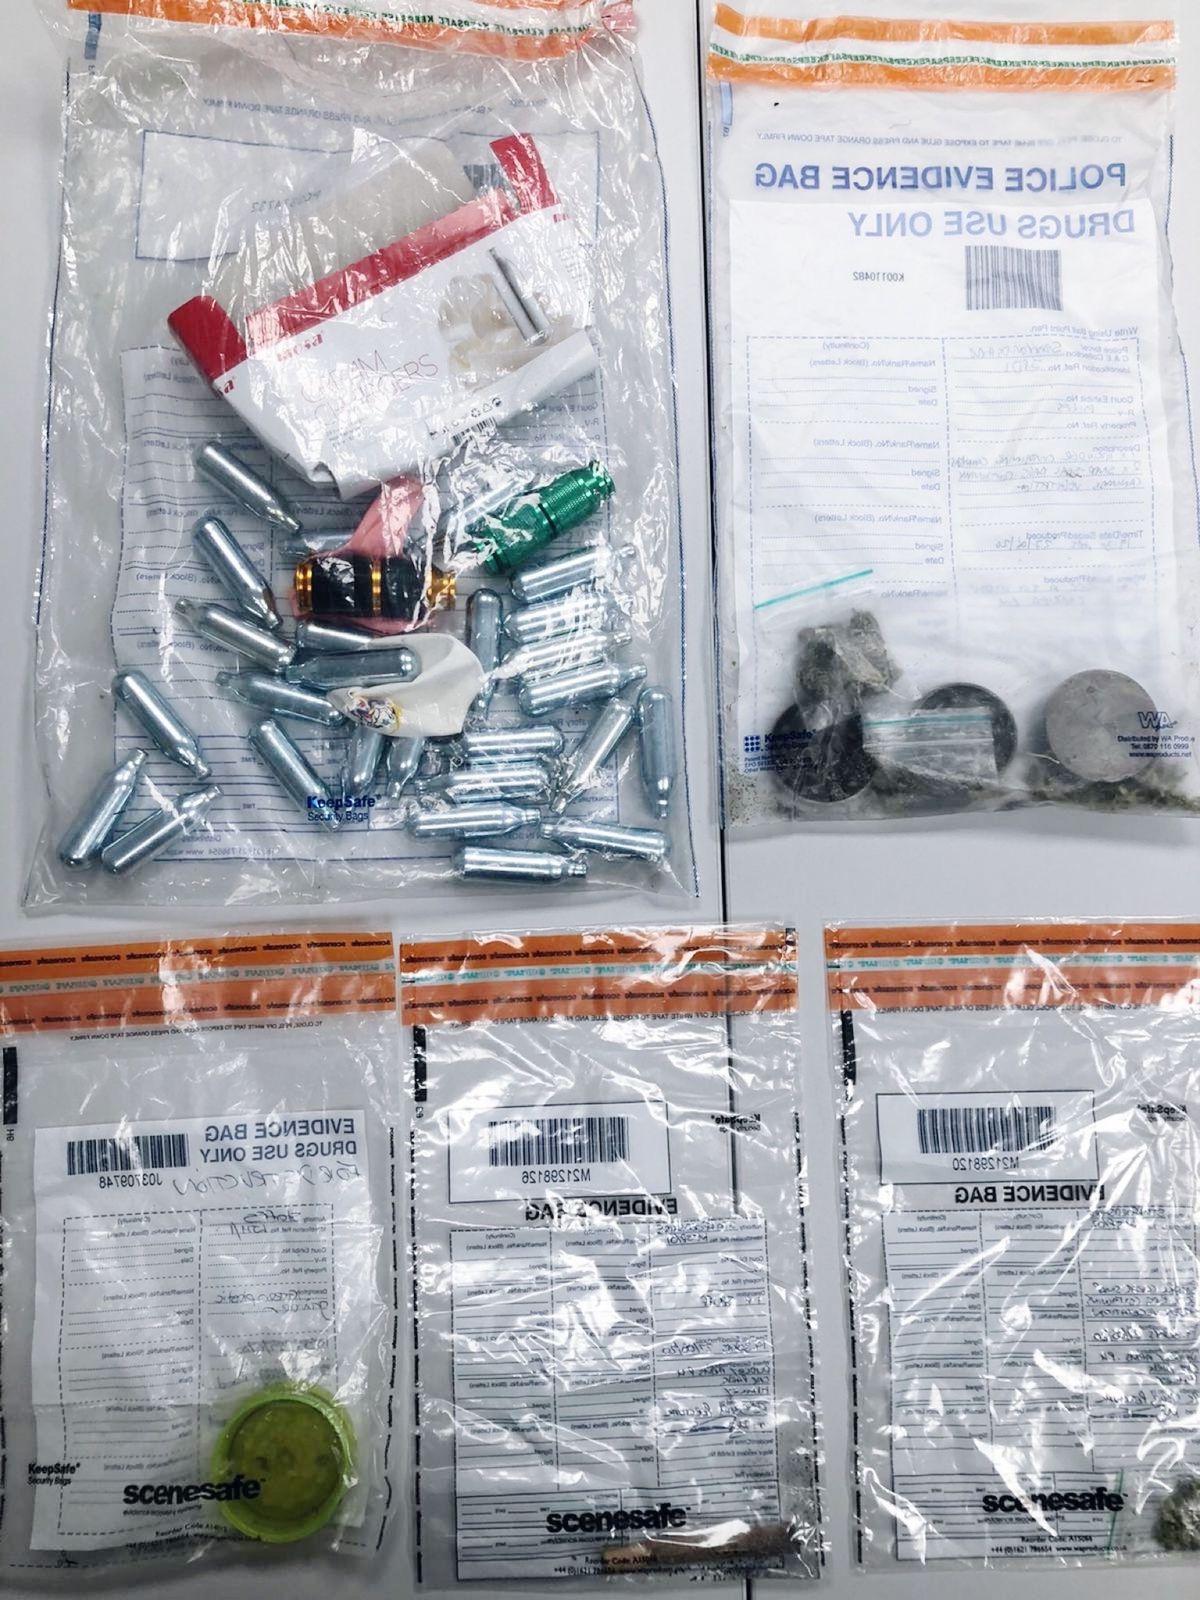 Items seized  by police. Photo: South Staffs Police